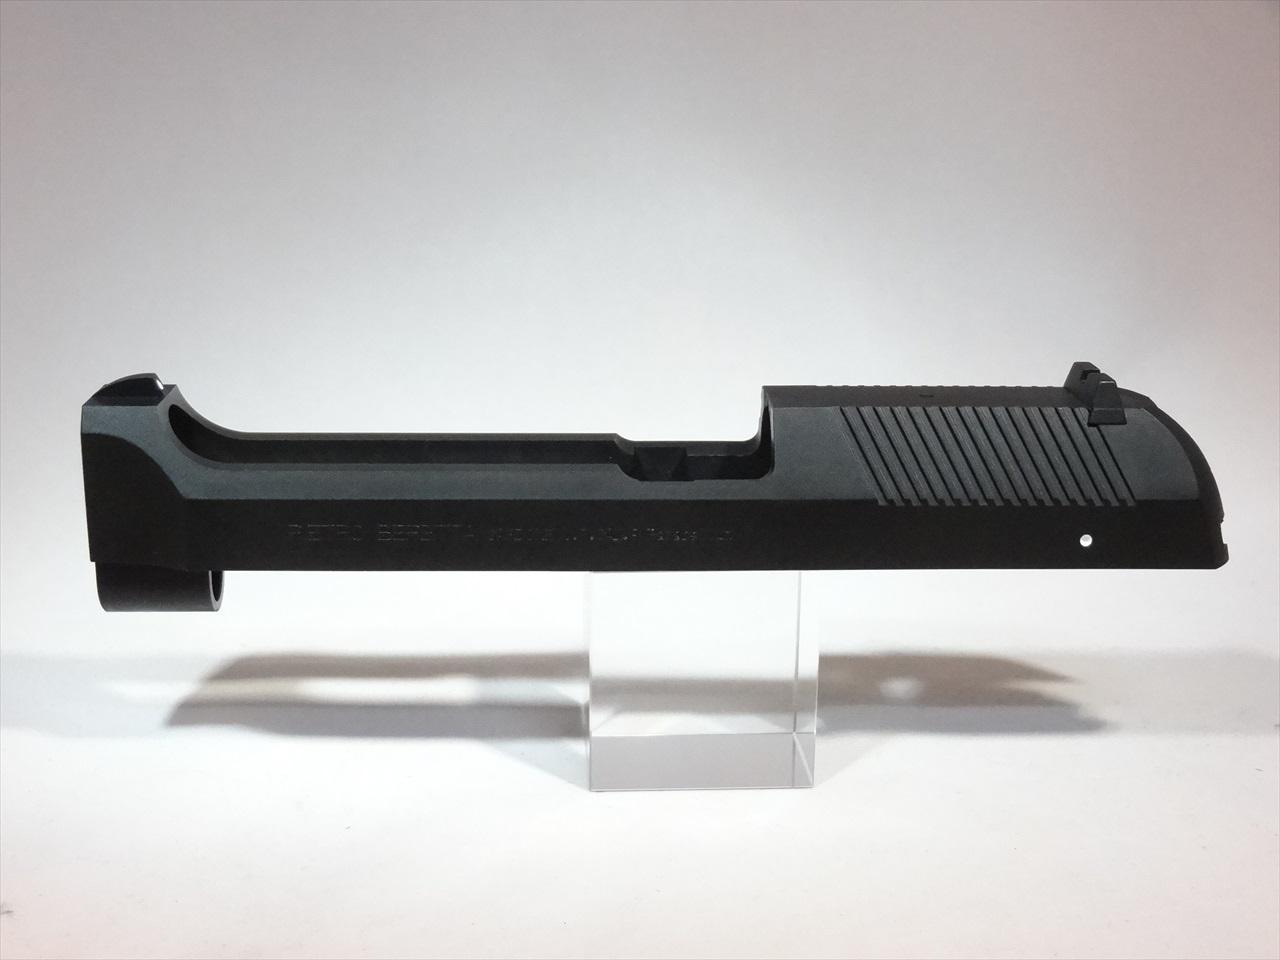 KSC M93R-Ⅱ(07) スライド(ABS) No.800